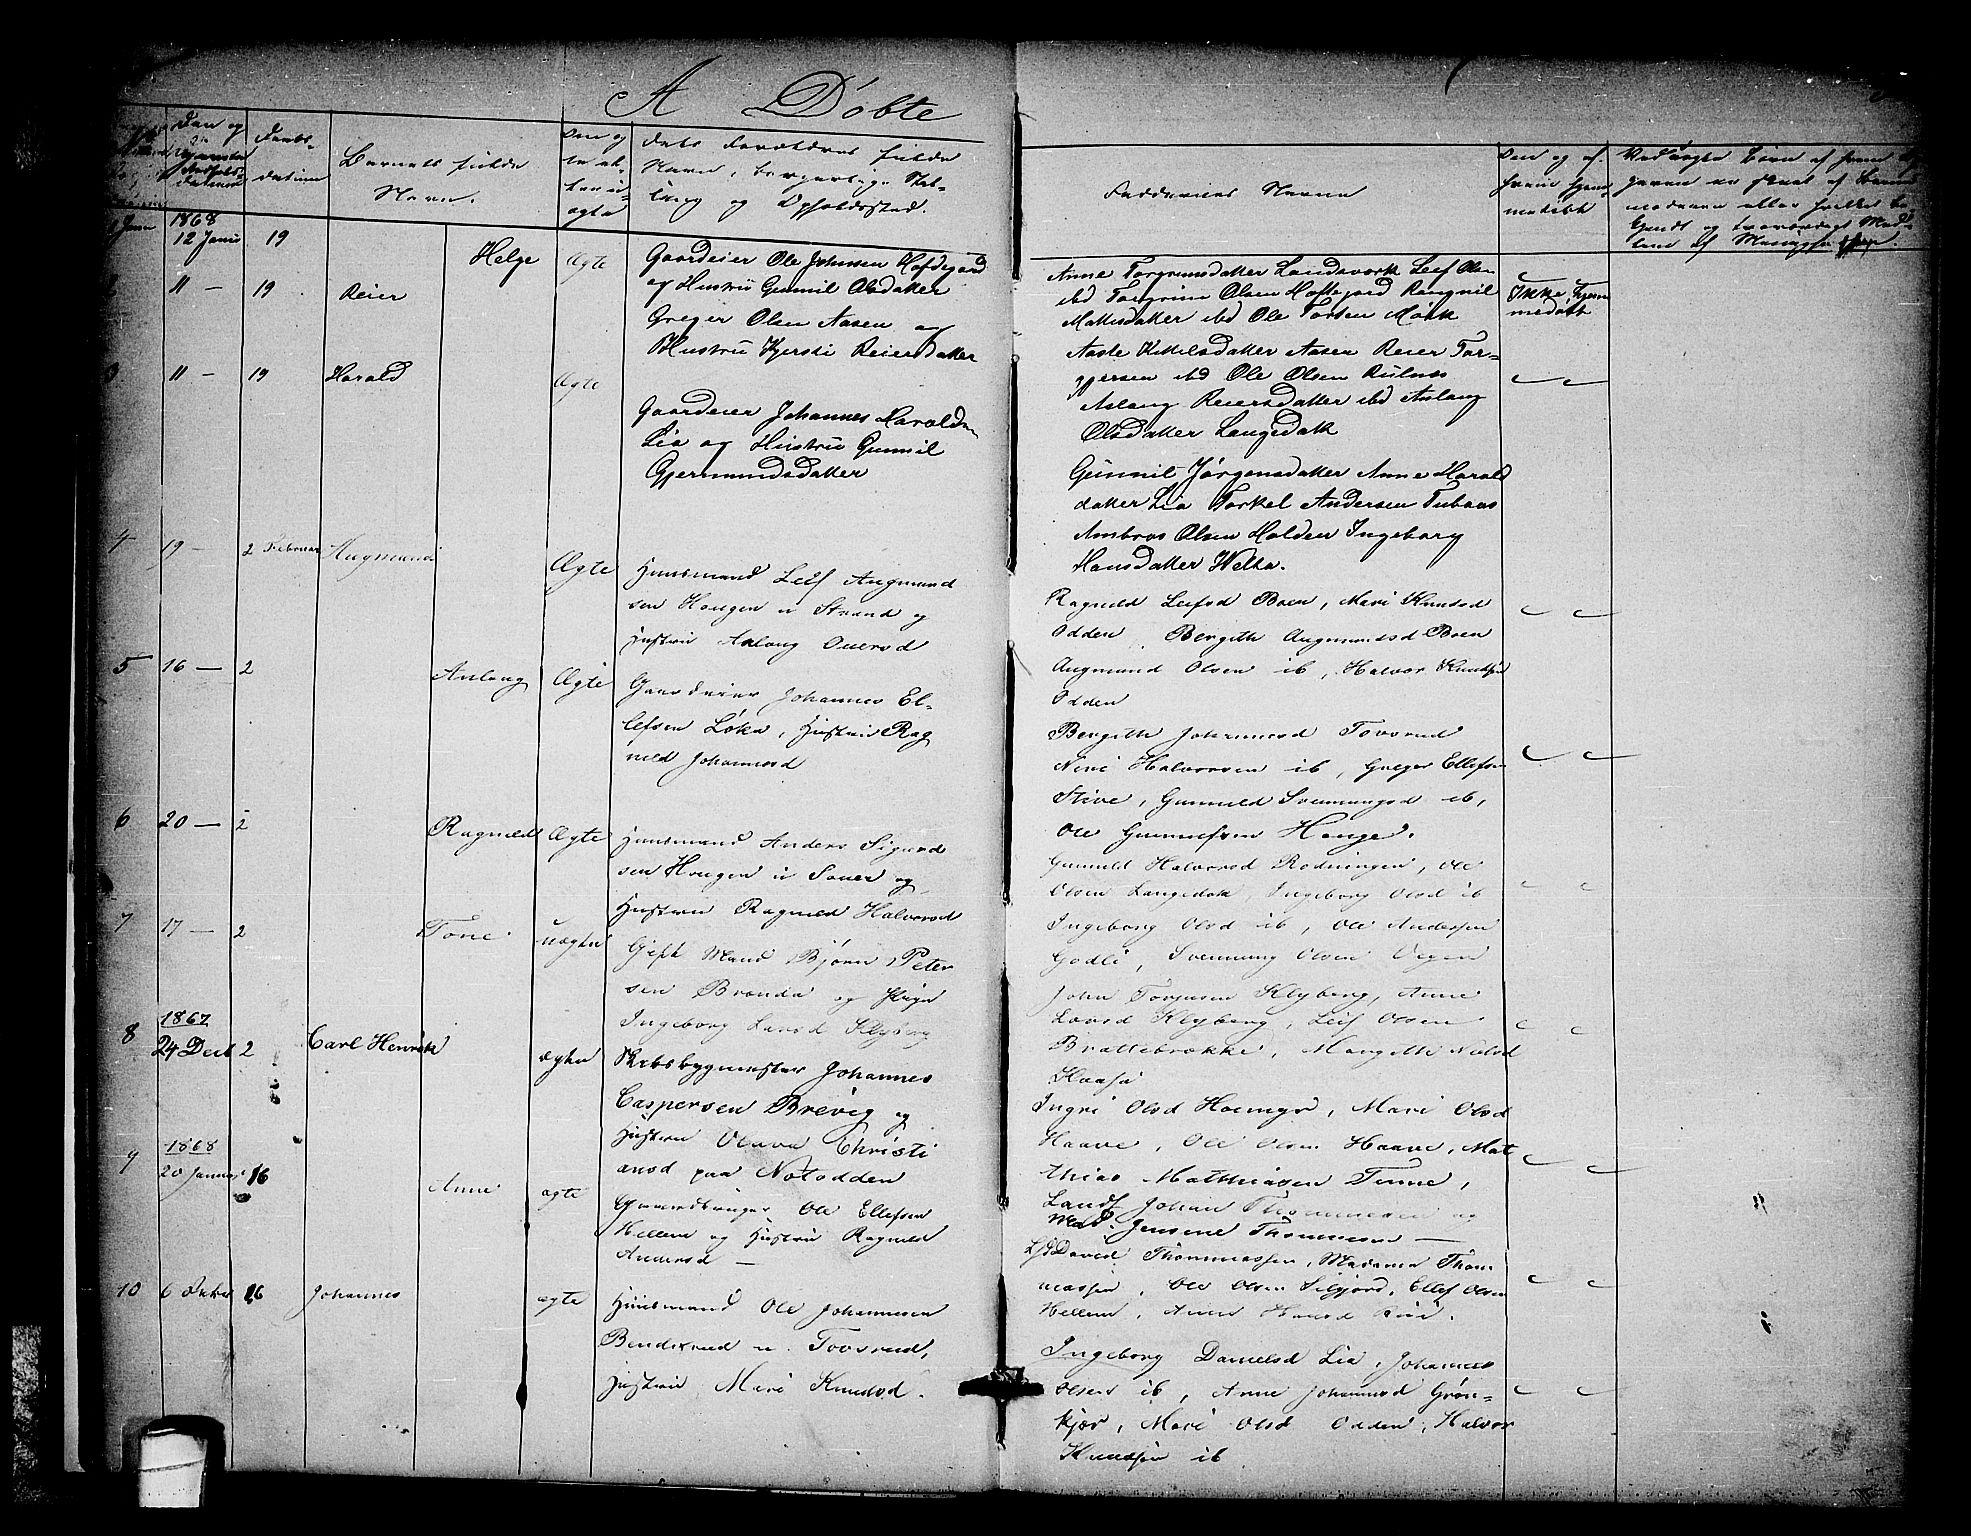 SAKO, Heddal kirkebøker, G/Ga/L0001: Klokkerbok nr. I 1, 1866-1878, s. 30-31